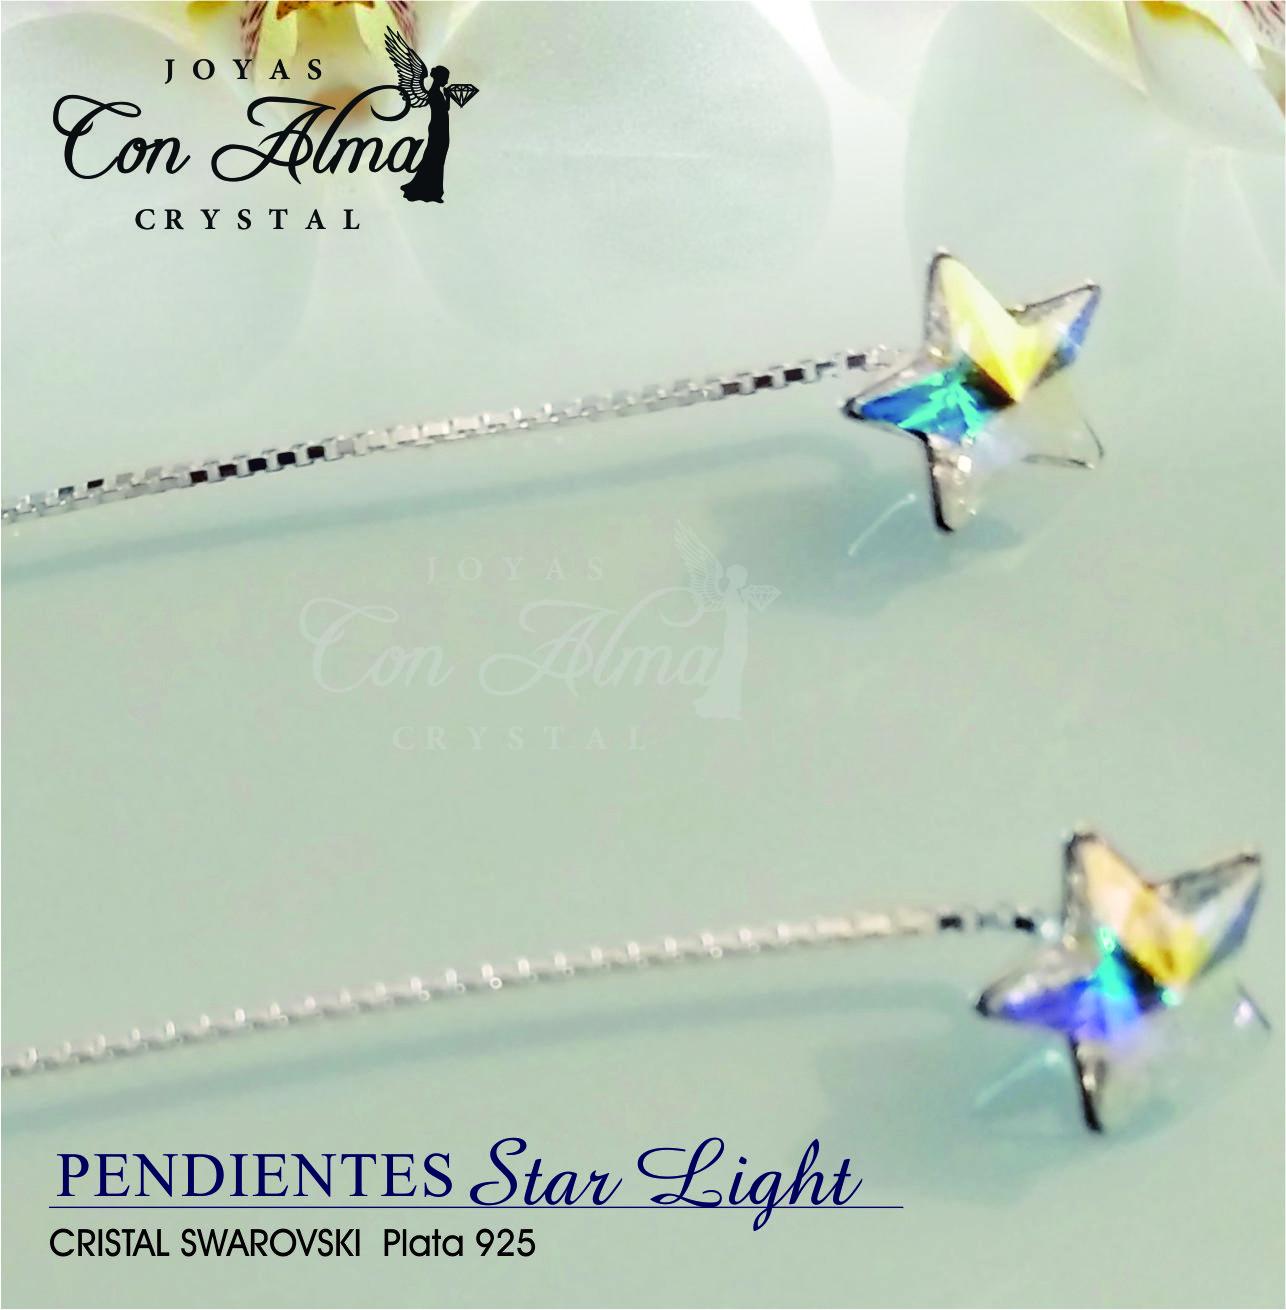 Pendientes Star Light 19,99 €